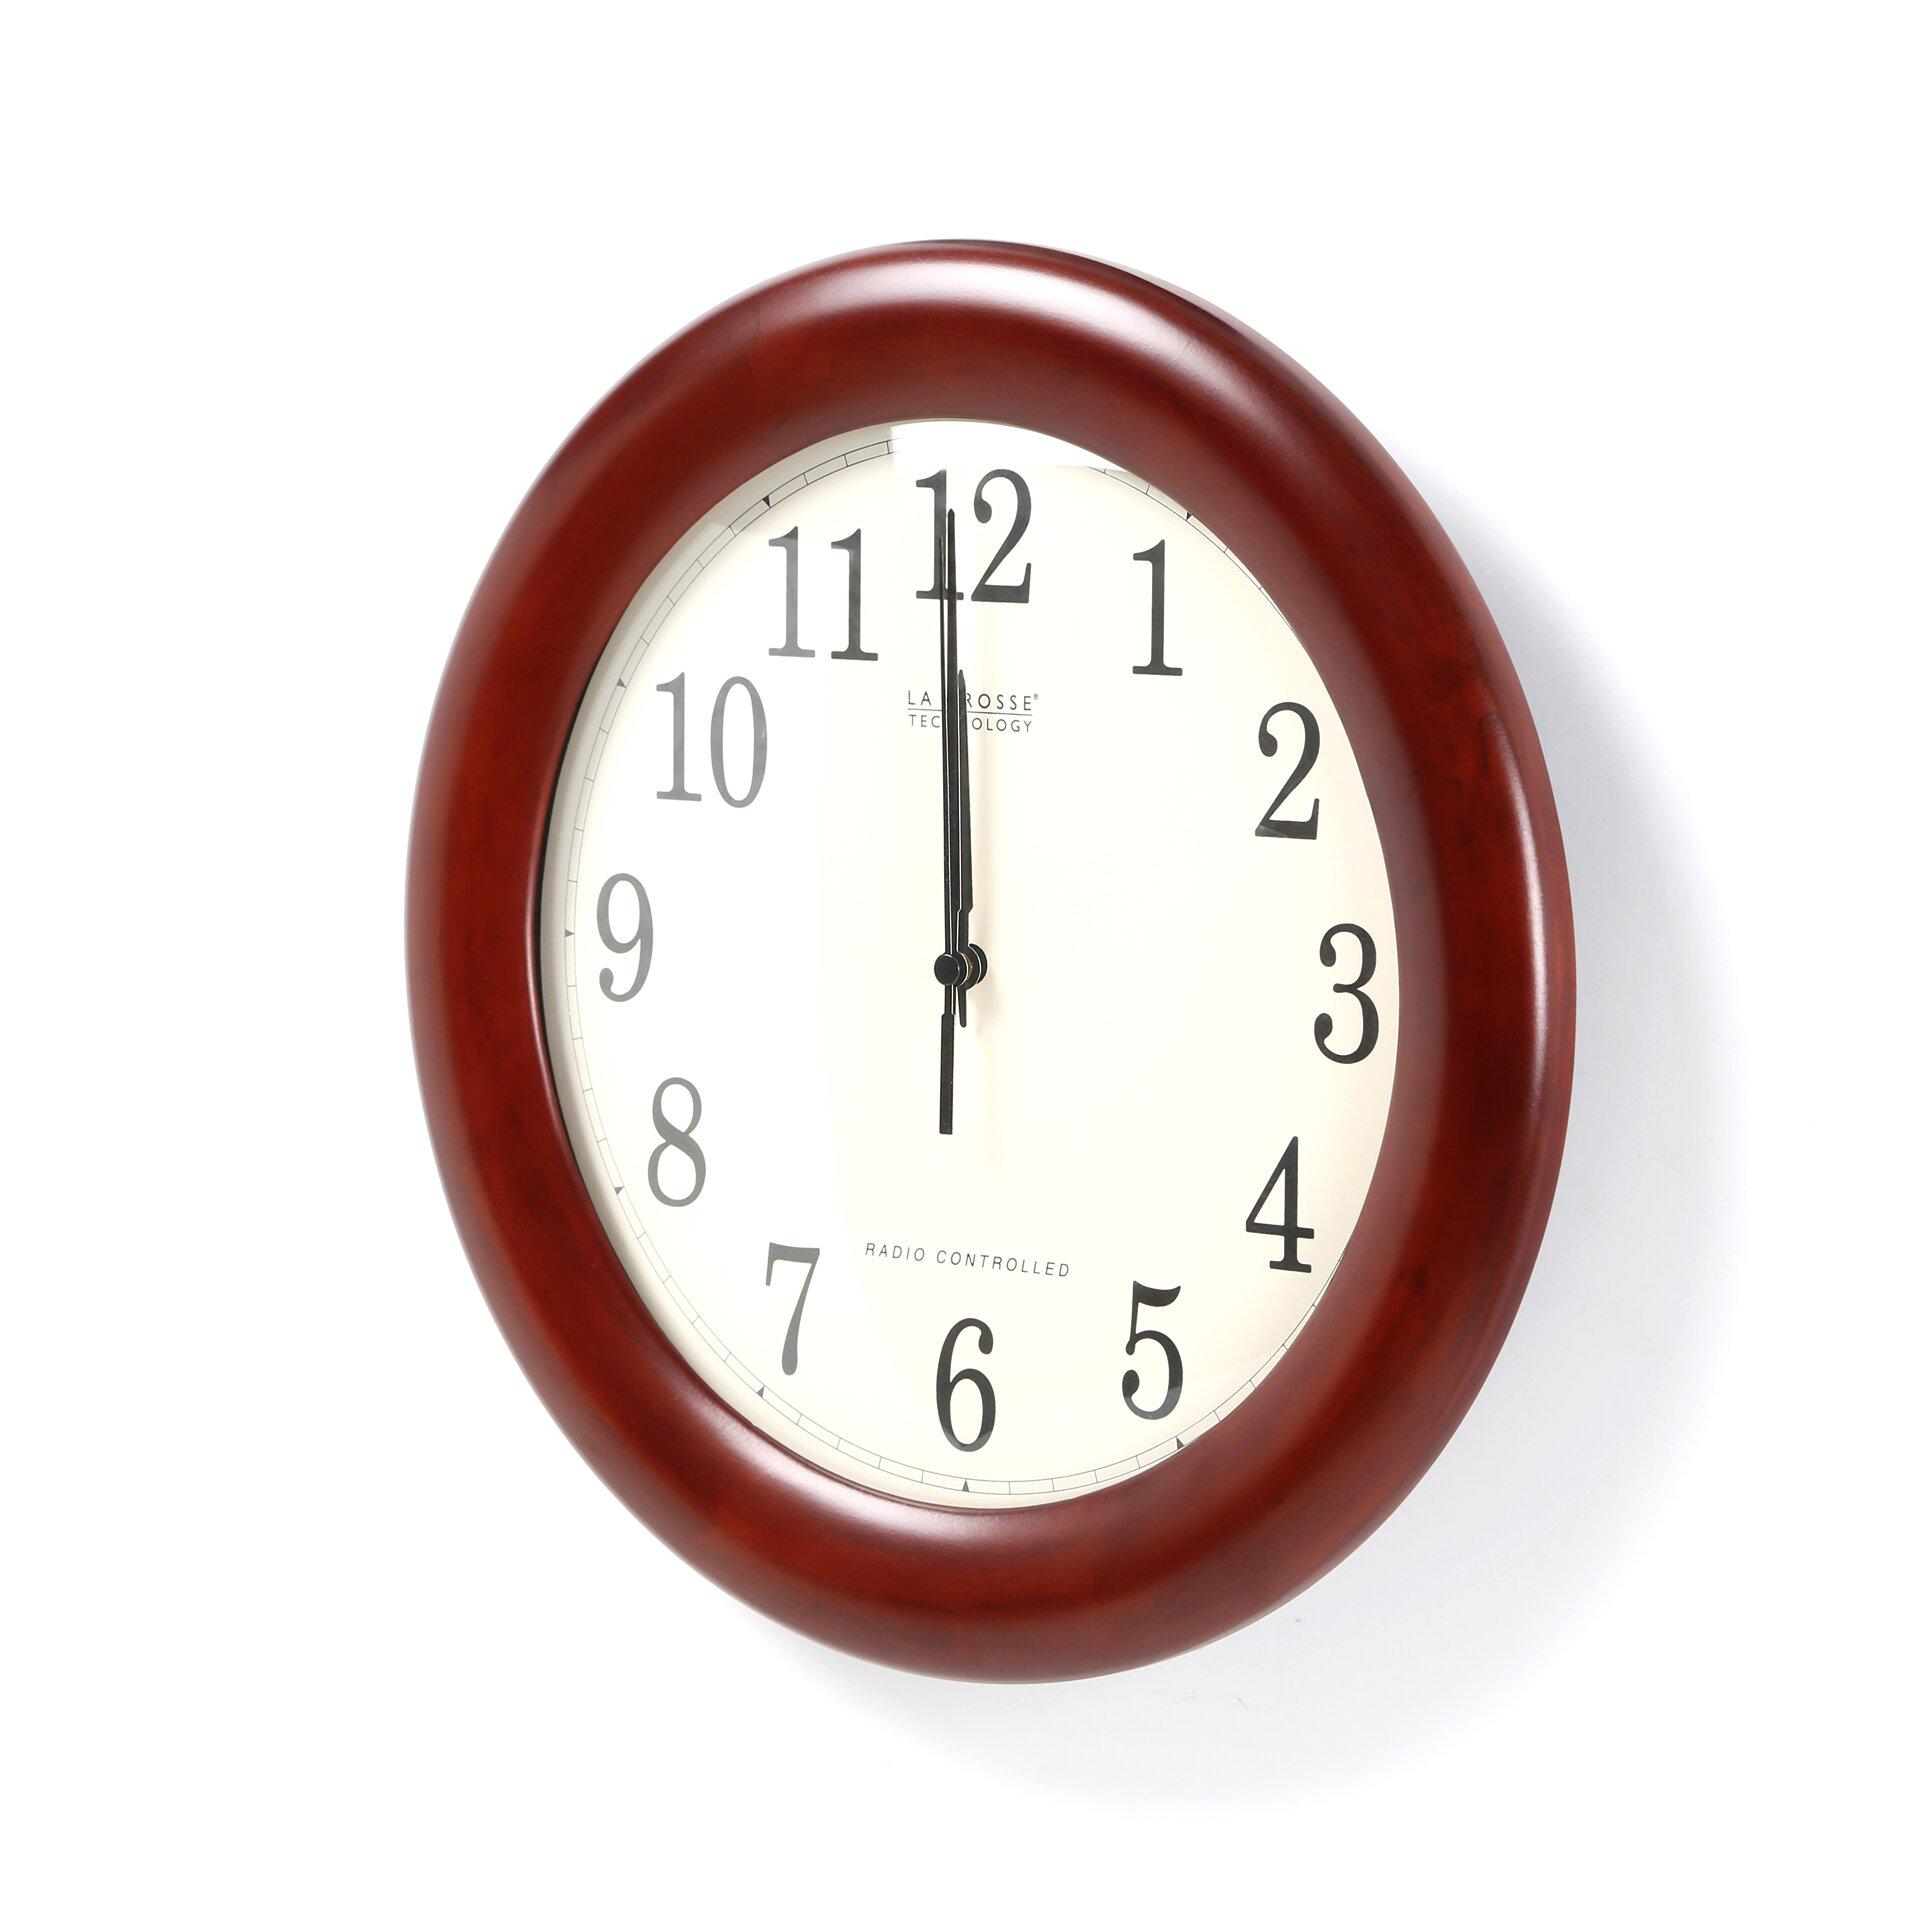 Alcott Hill 12 5 Analog Atomic Wall Clock Reviews Wayfair